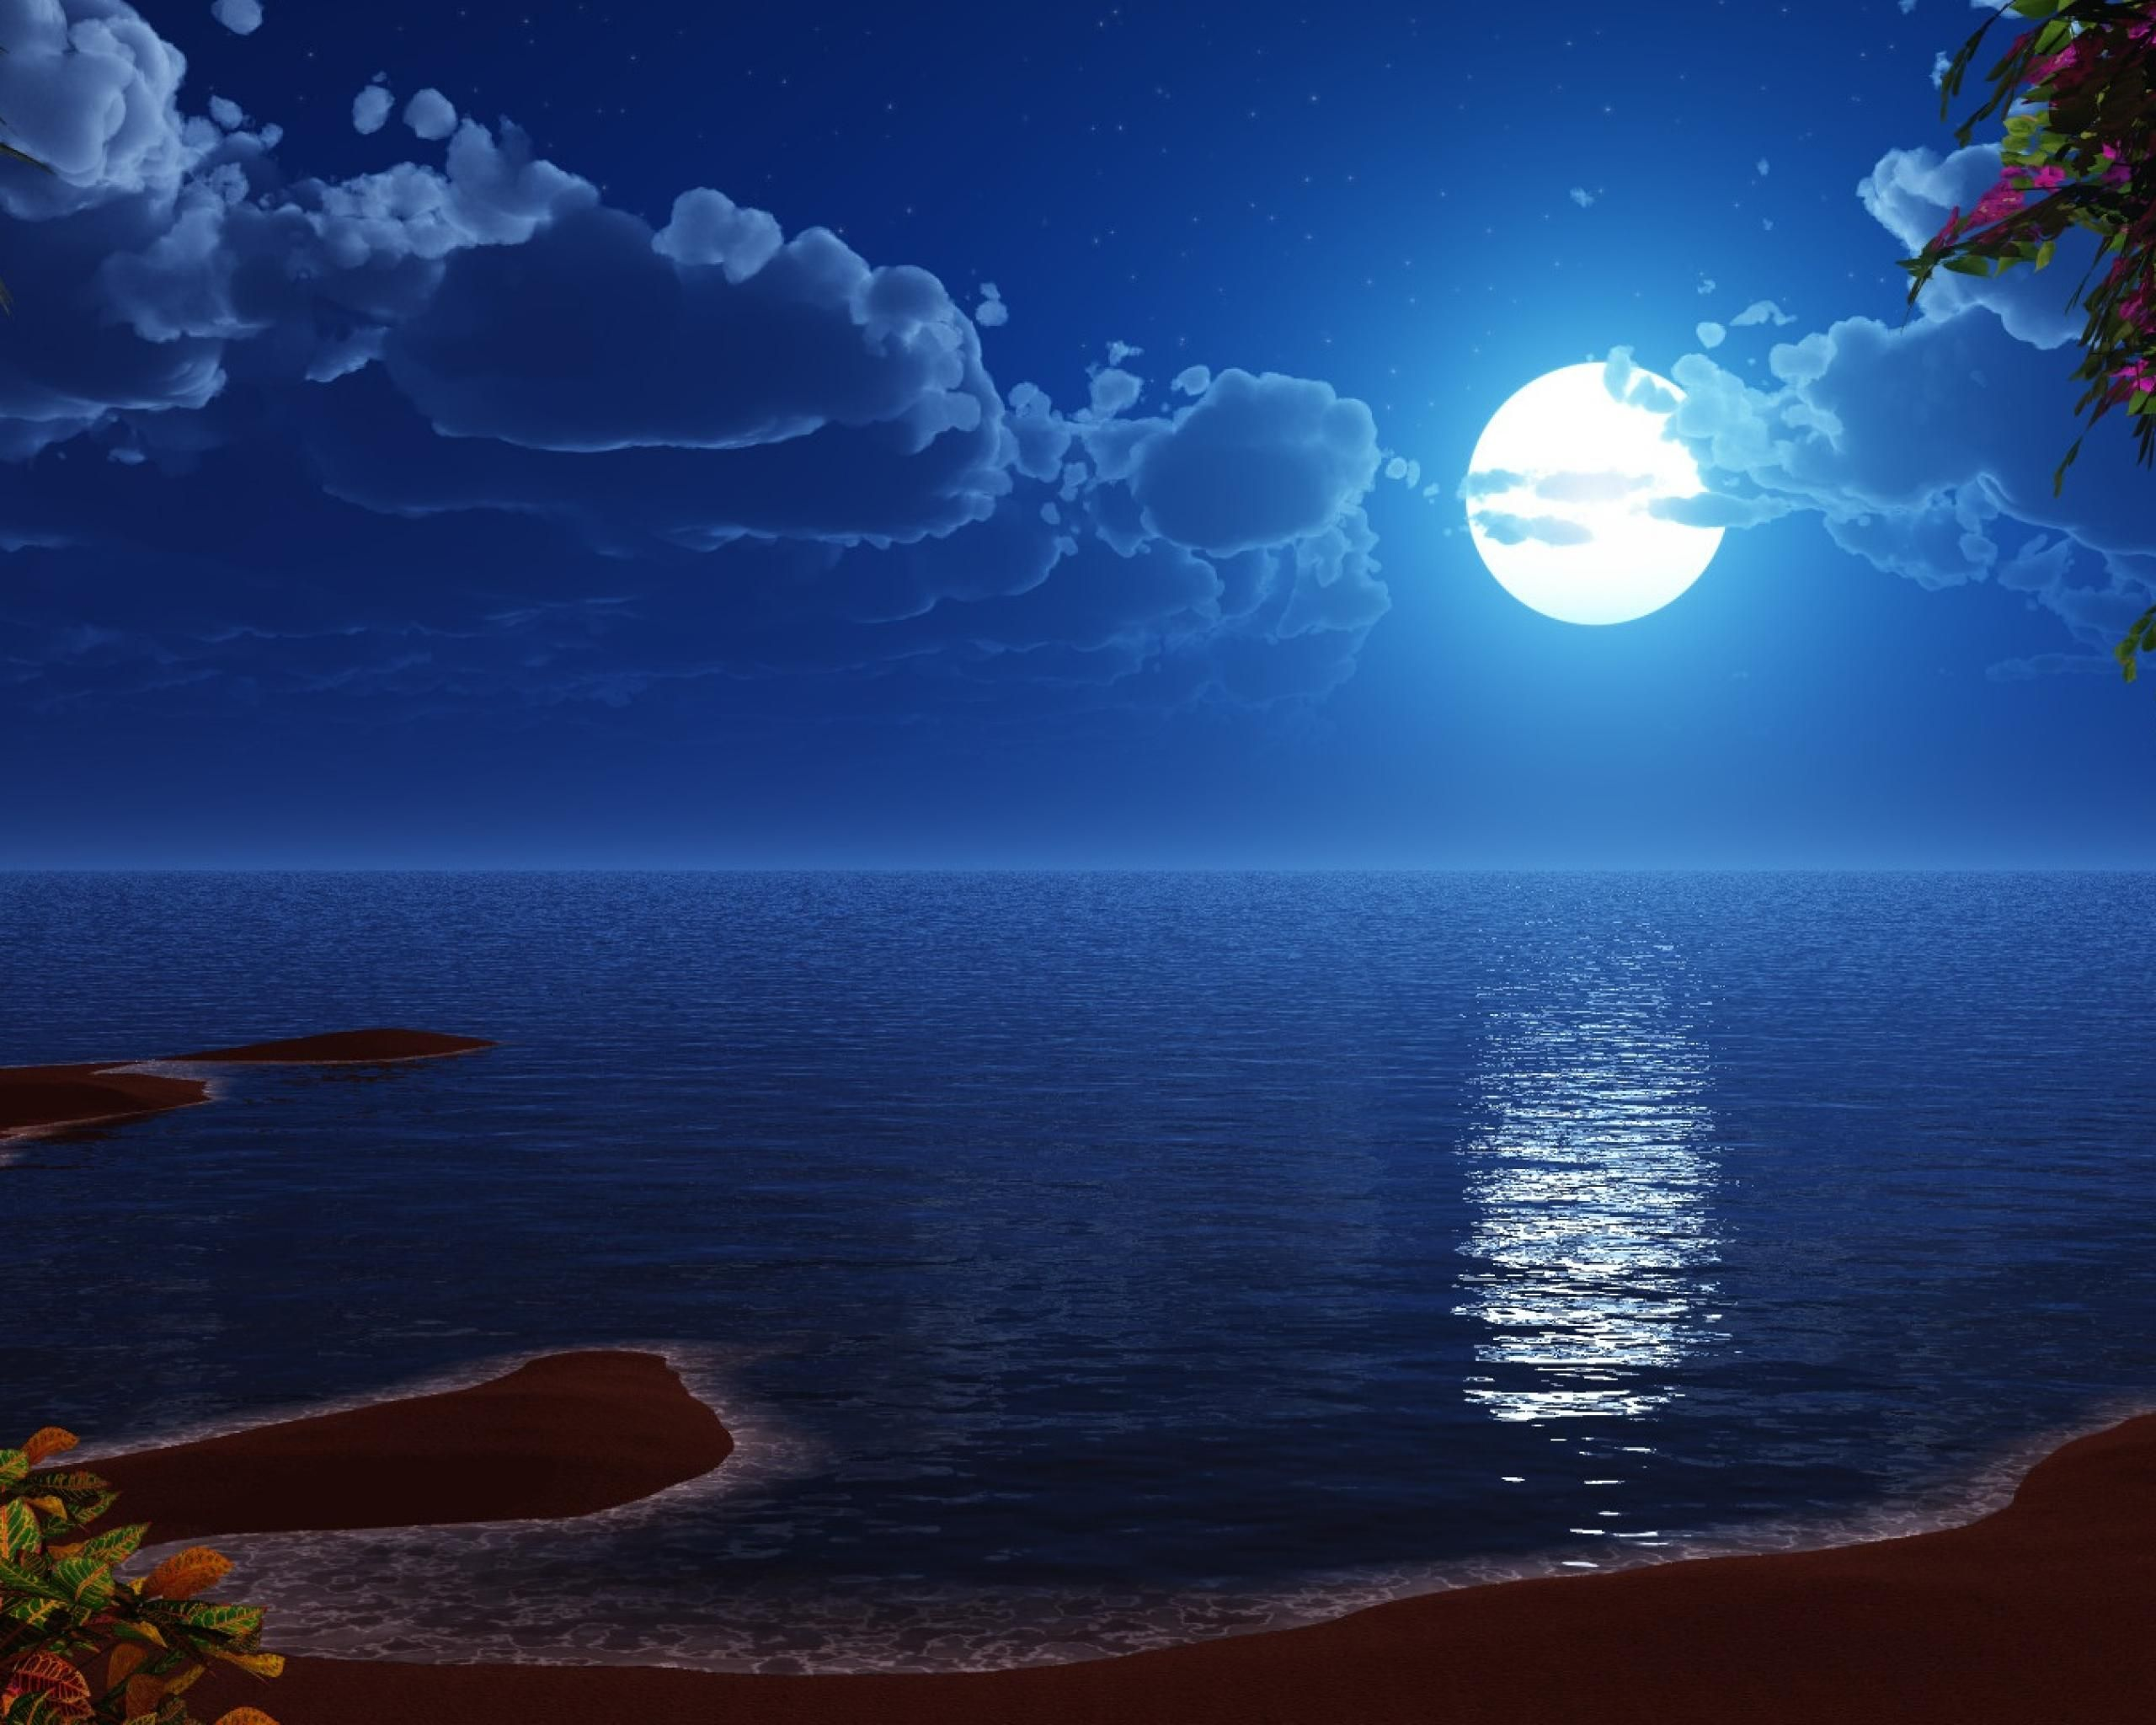 Blue Moon Wallpaper Wallpaper Wide Hd Ocean At Night Beach At Night Nature Wallpaper